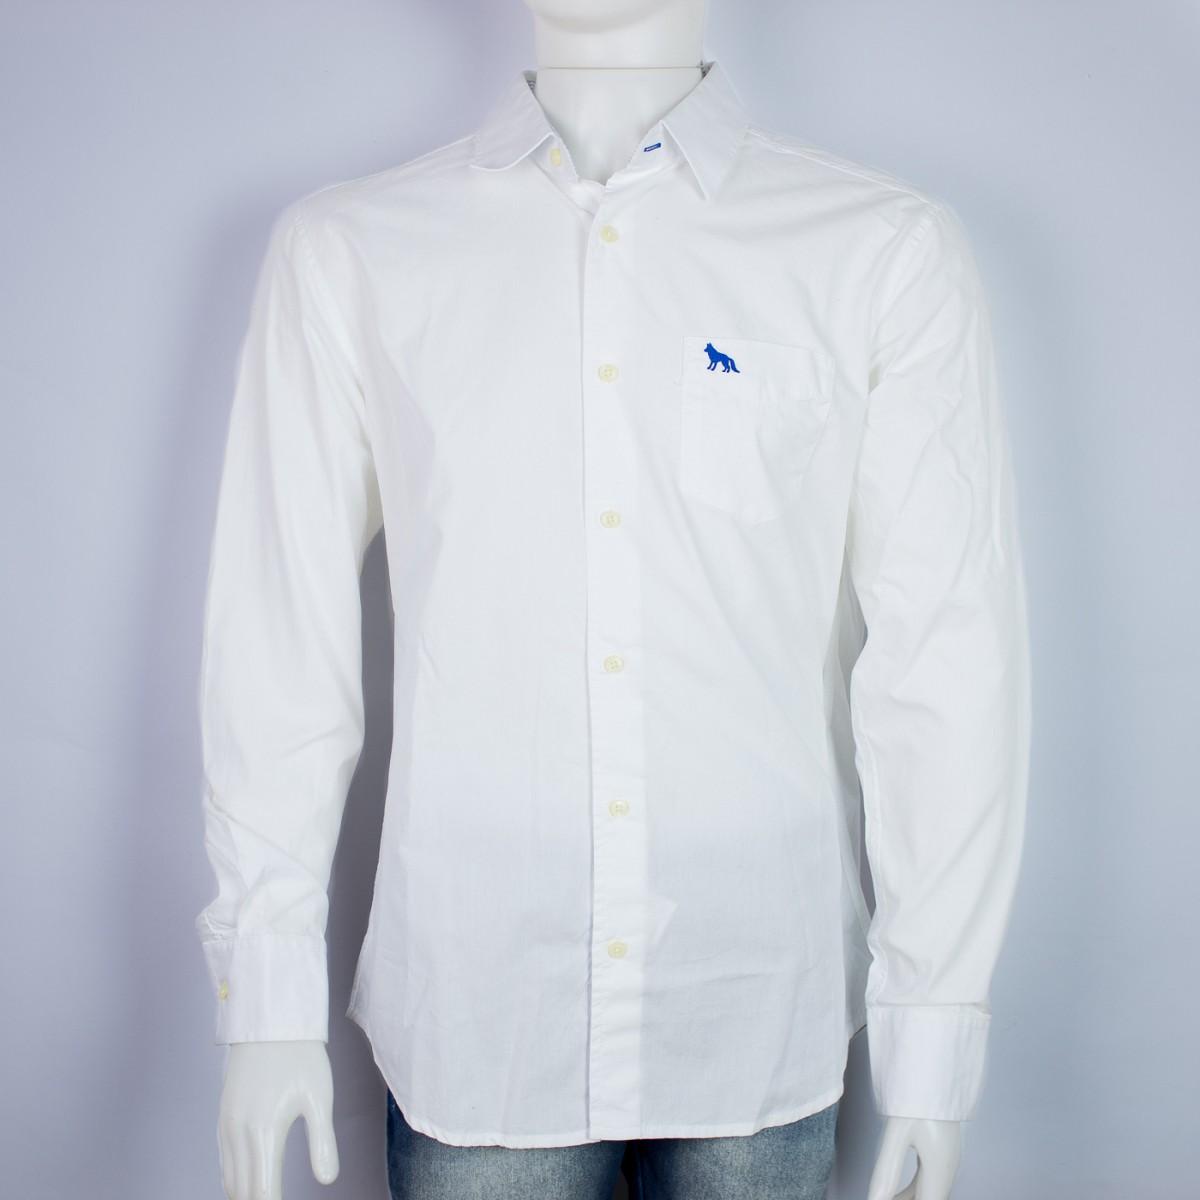 86e466460 Bizz Store - Camisa Social Masculina Acostamento Branca Lisa